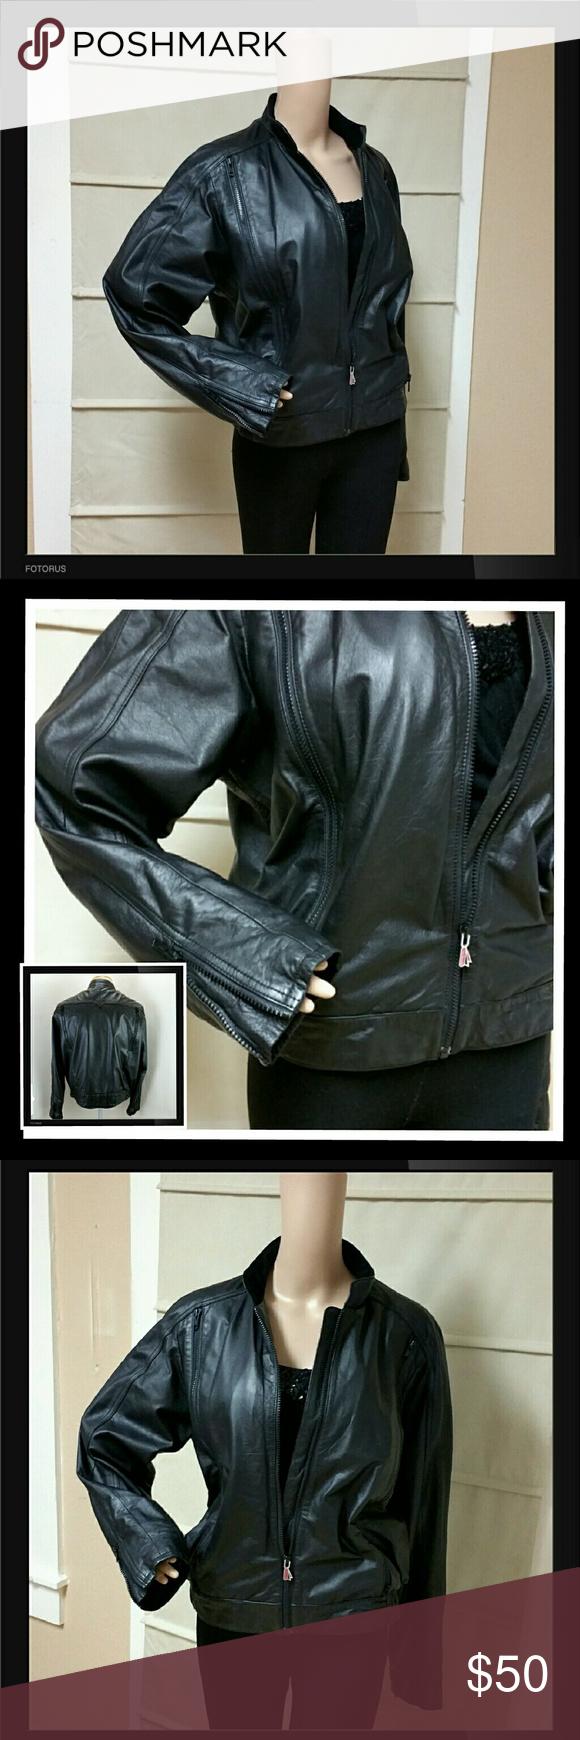 729d3e37b098 Selling this Hein Gericke Women s Leather Motorcycle Jacket on Poshmark! My  username is  phoenixbella.  shopmycloset  poshmark  fashion  shopping   style ...